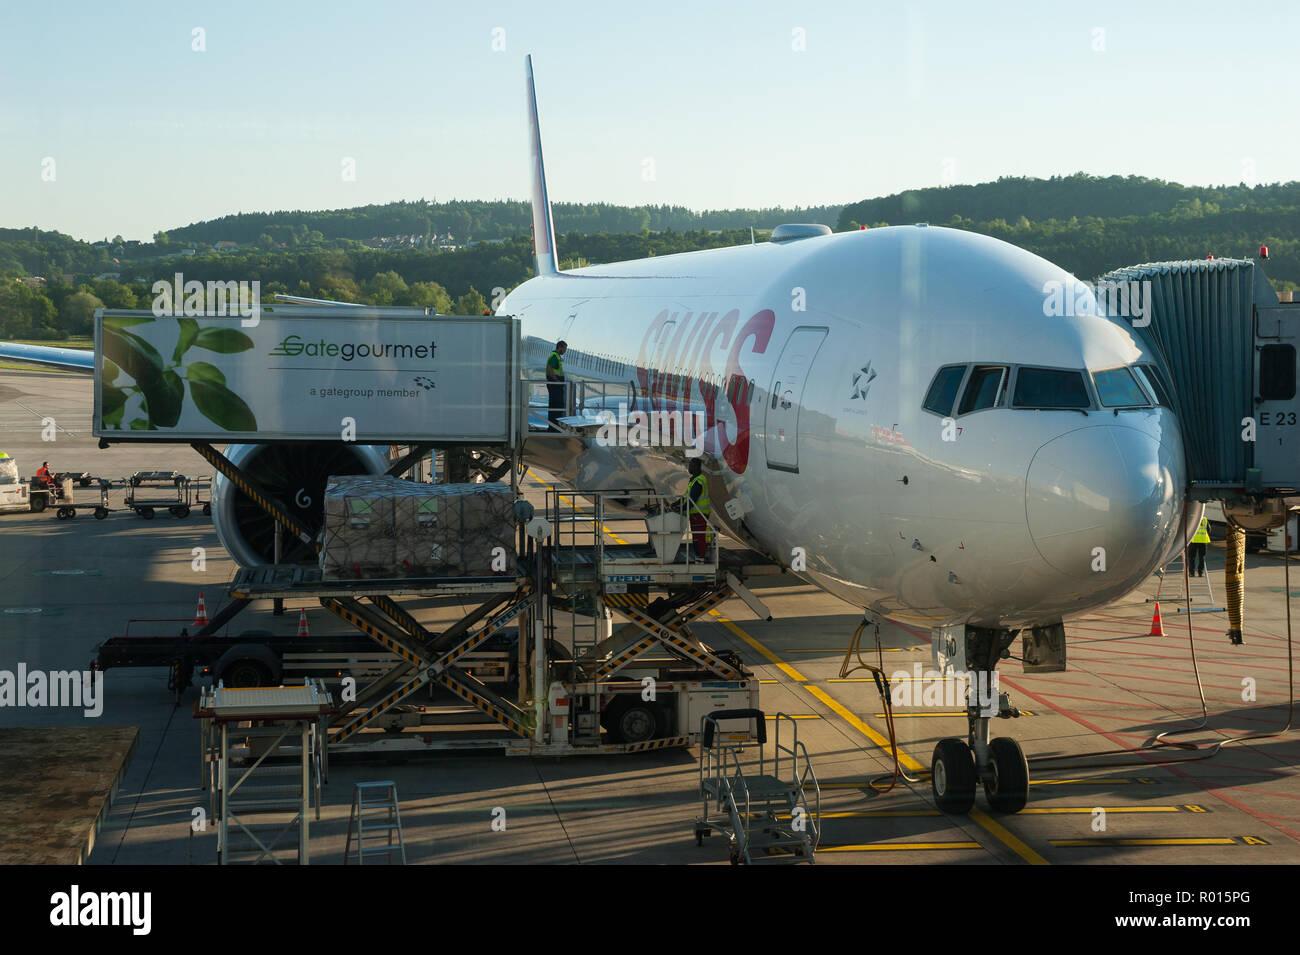 Zuerich, Svizzera, aereo all'aeroporto Zuerich-Kloten Foto Stock